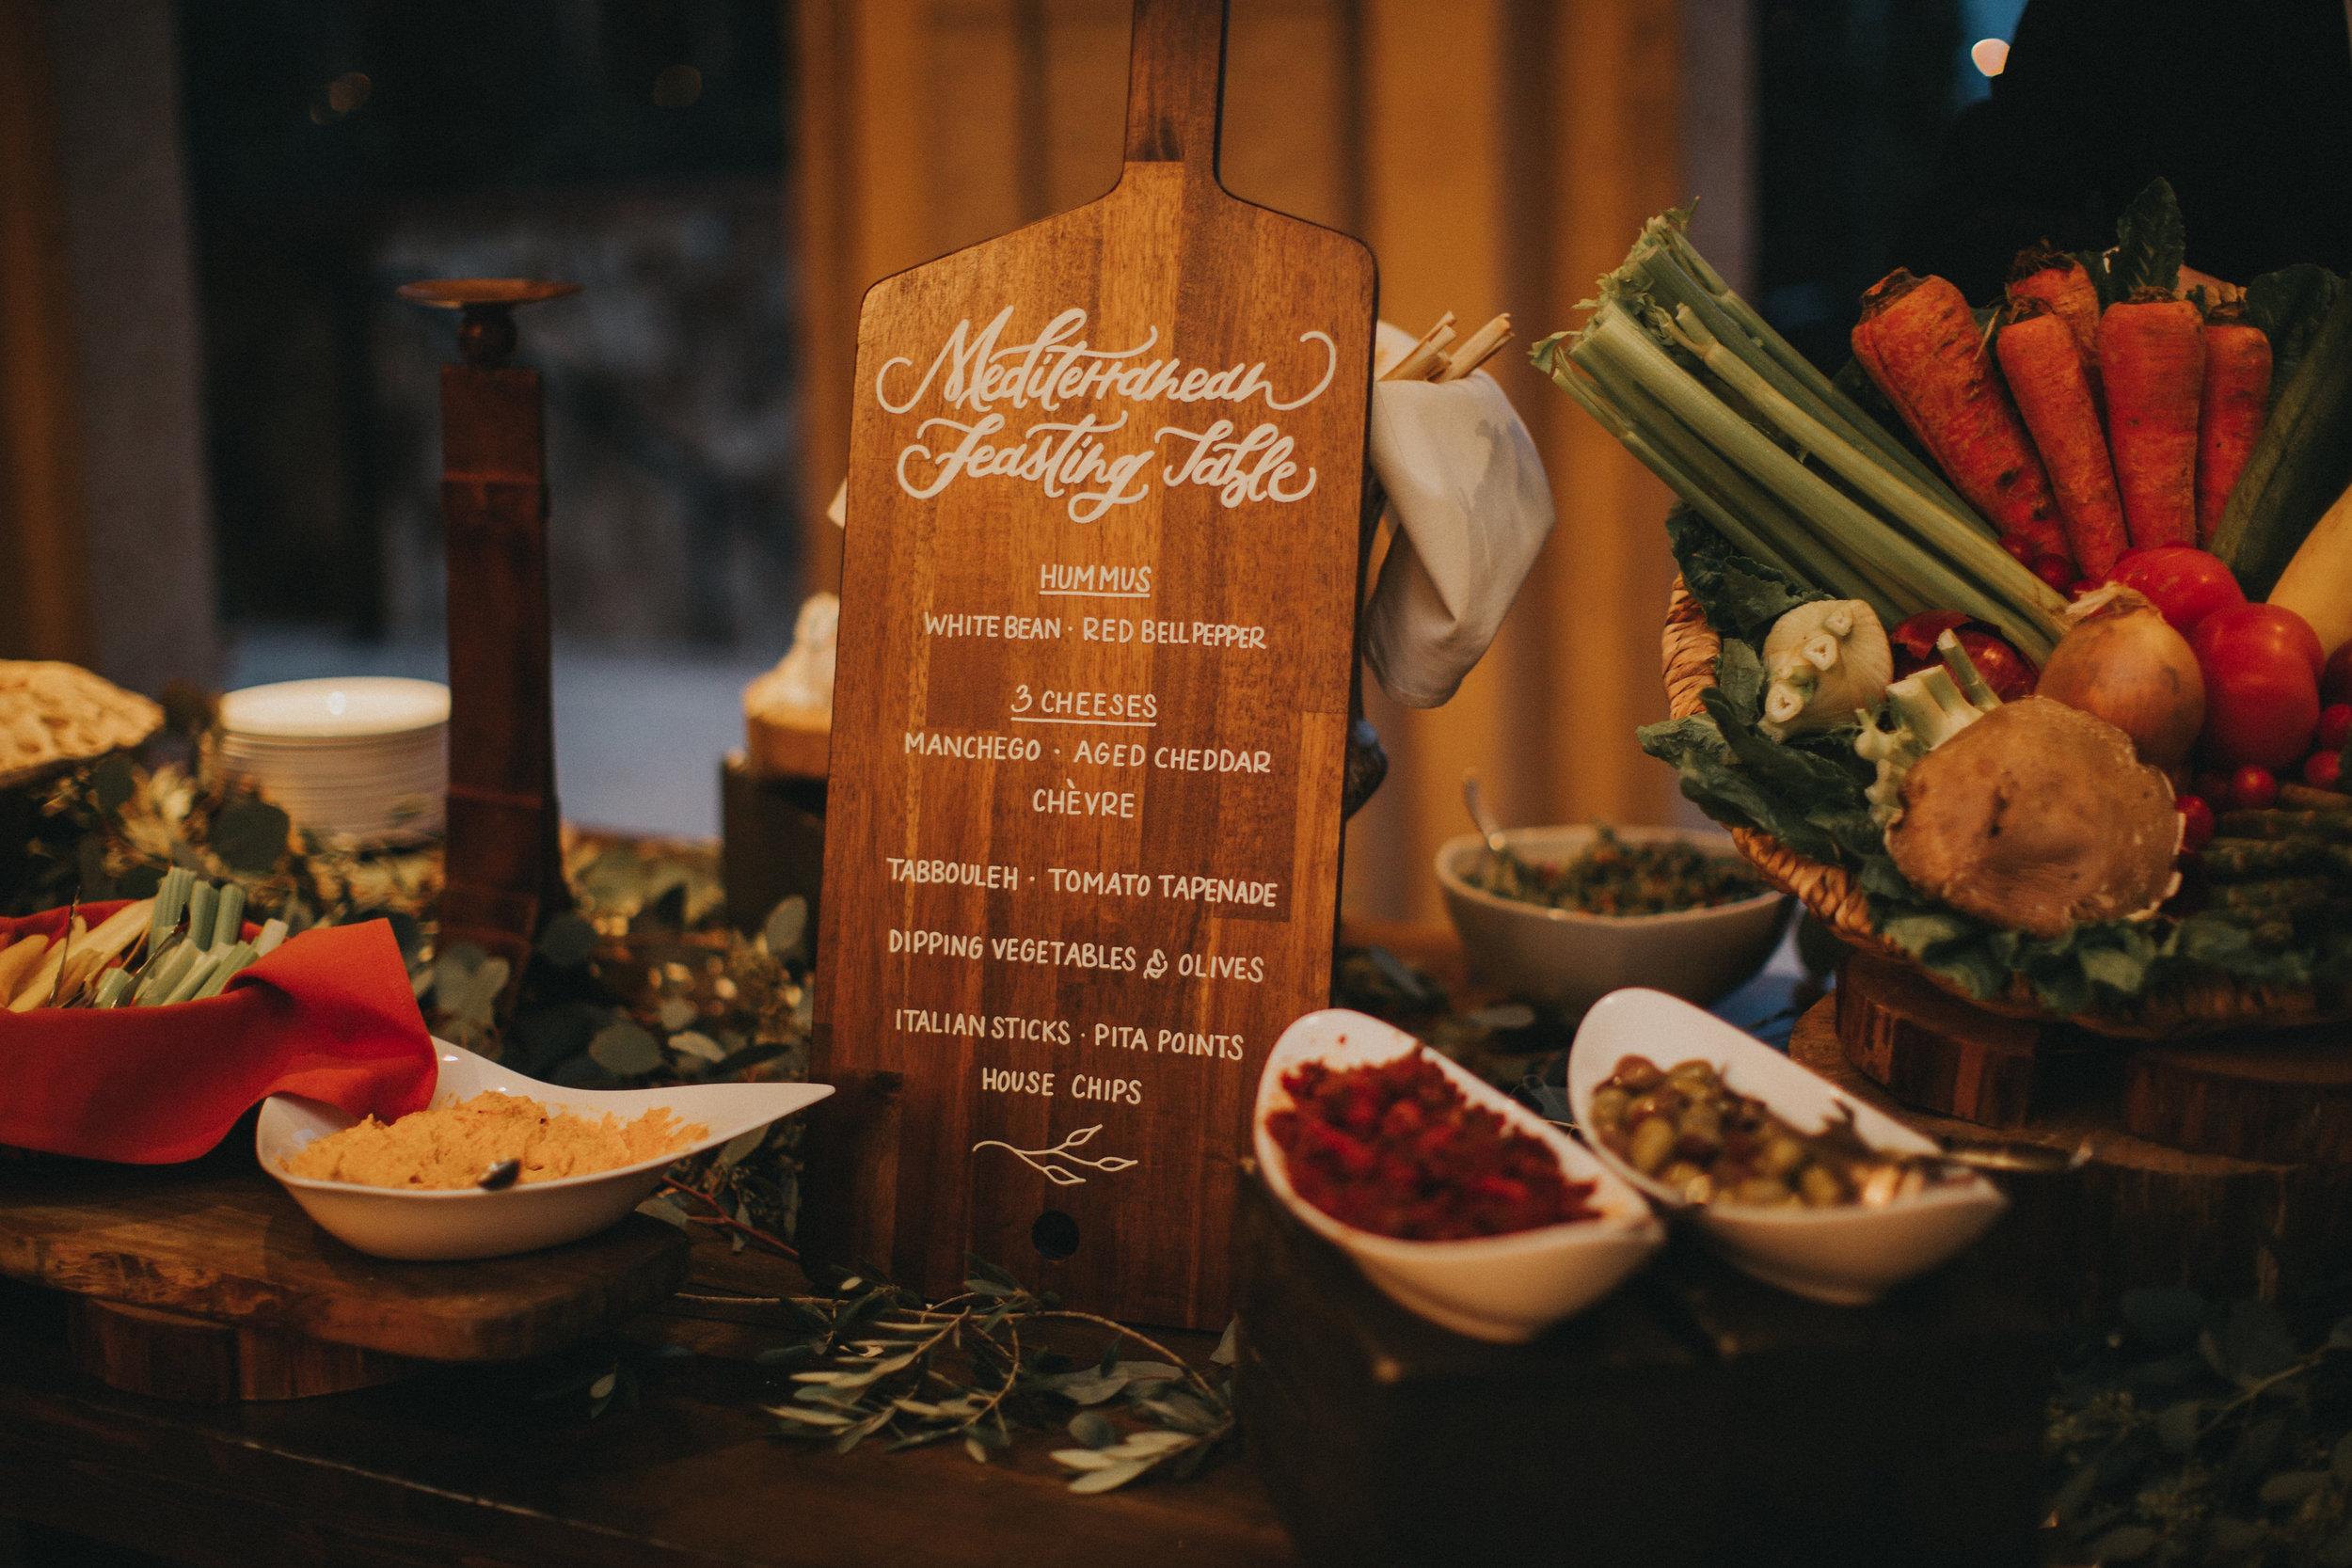 Cocktail Hour Menu: Mediterranean Feasting Table